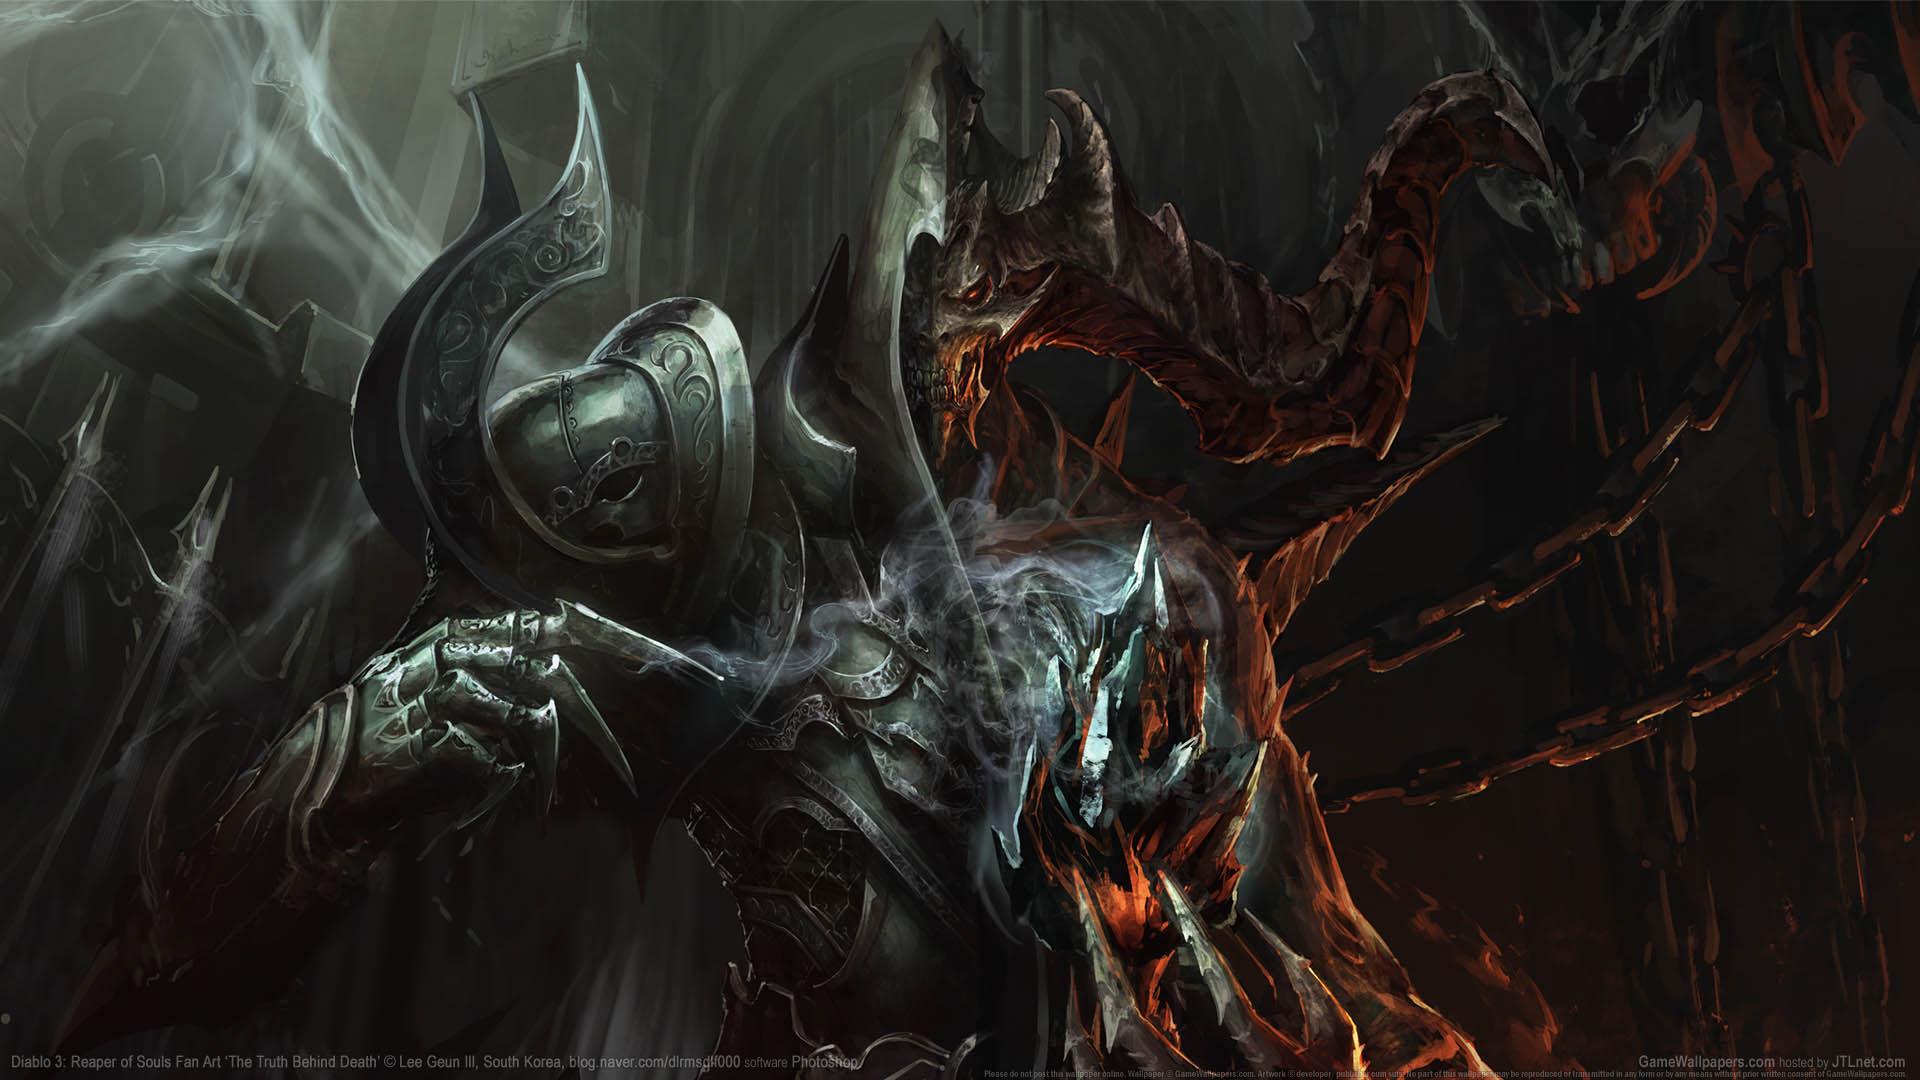 Diablo 3 Reaper Of Souls Fan Art Fondo De Escritorio 02